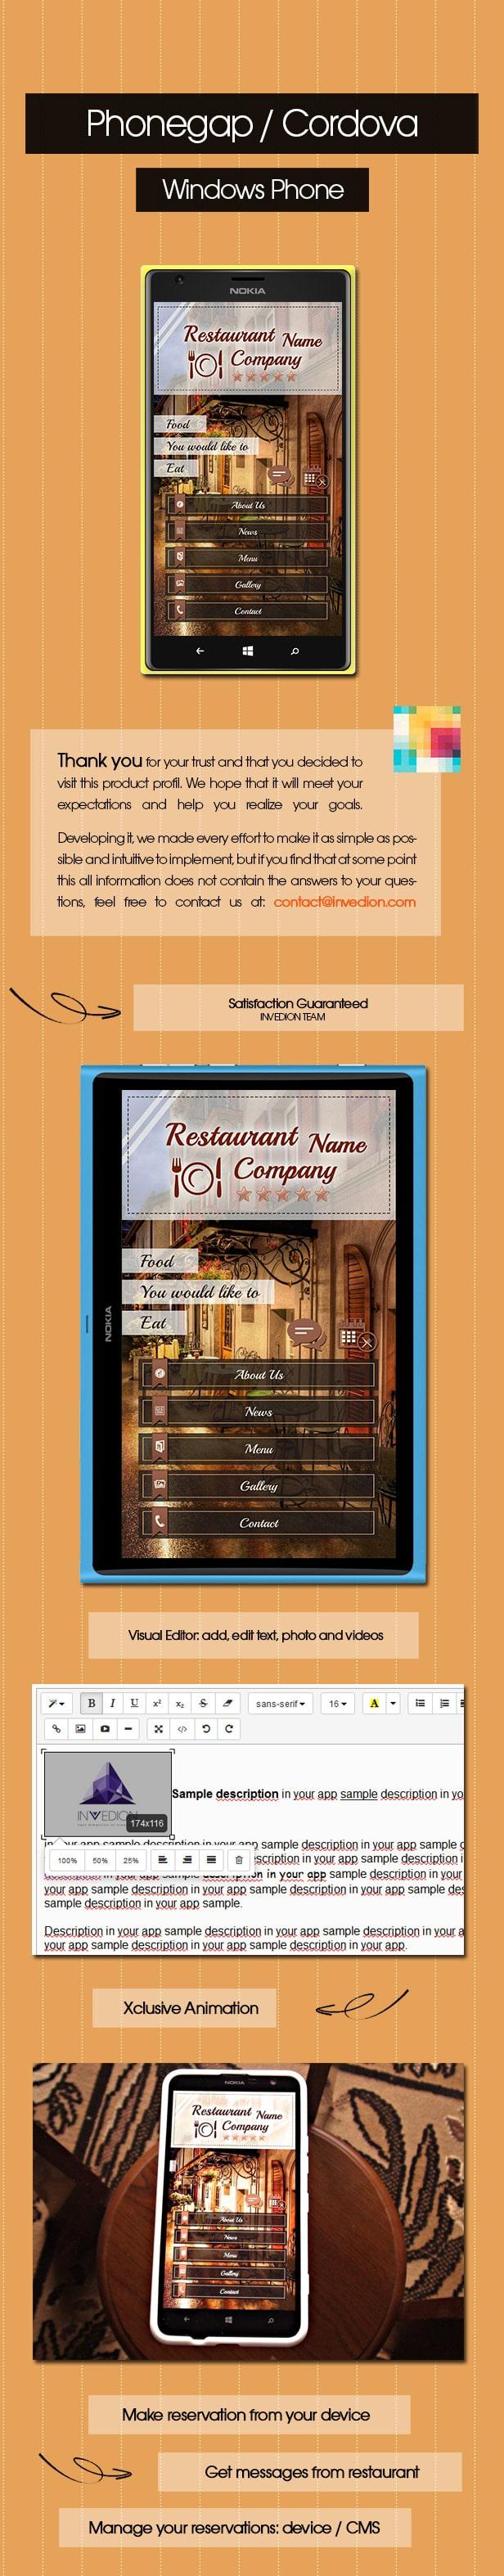 Restaurant App With CMS - Windows Phone 2